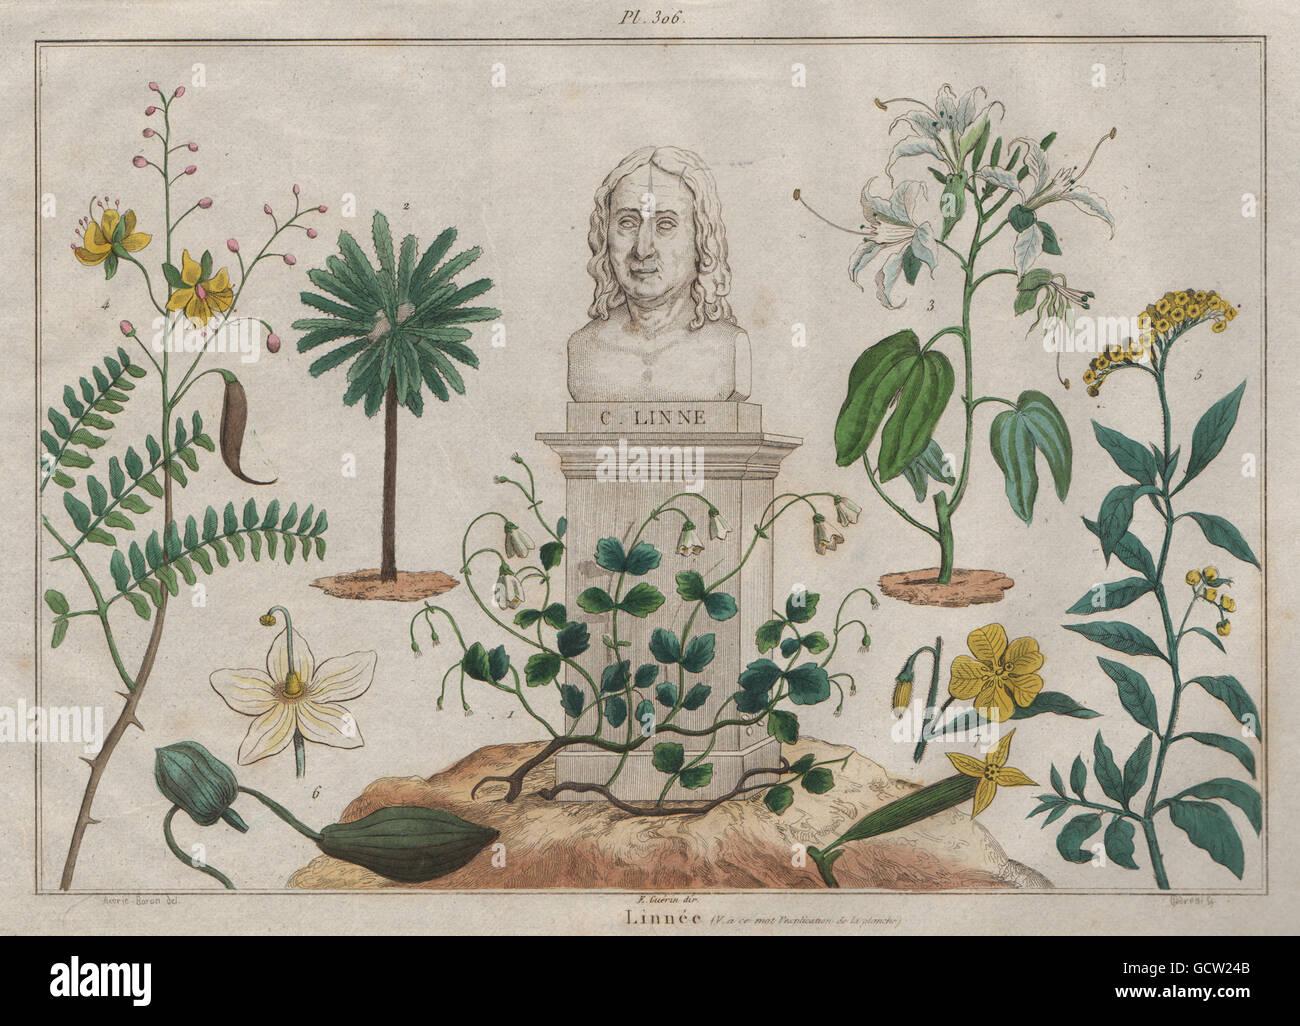 CARL LINNAEUS: Linnée. Botany Zoology Science, antique print 1833 - Stock Image